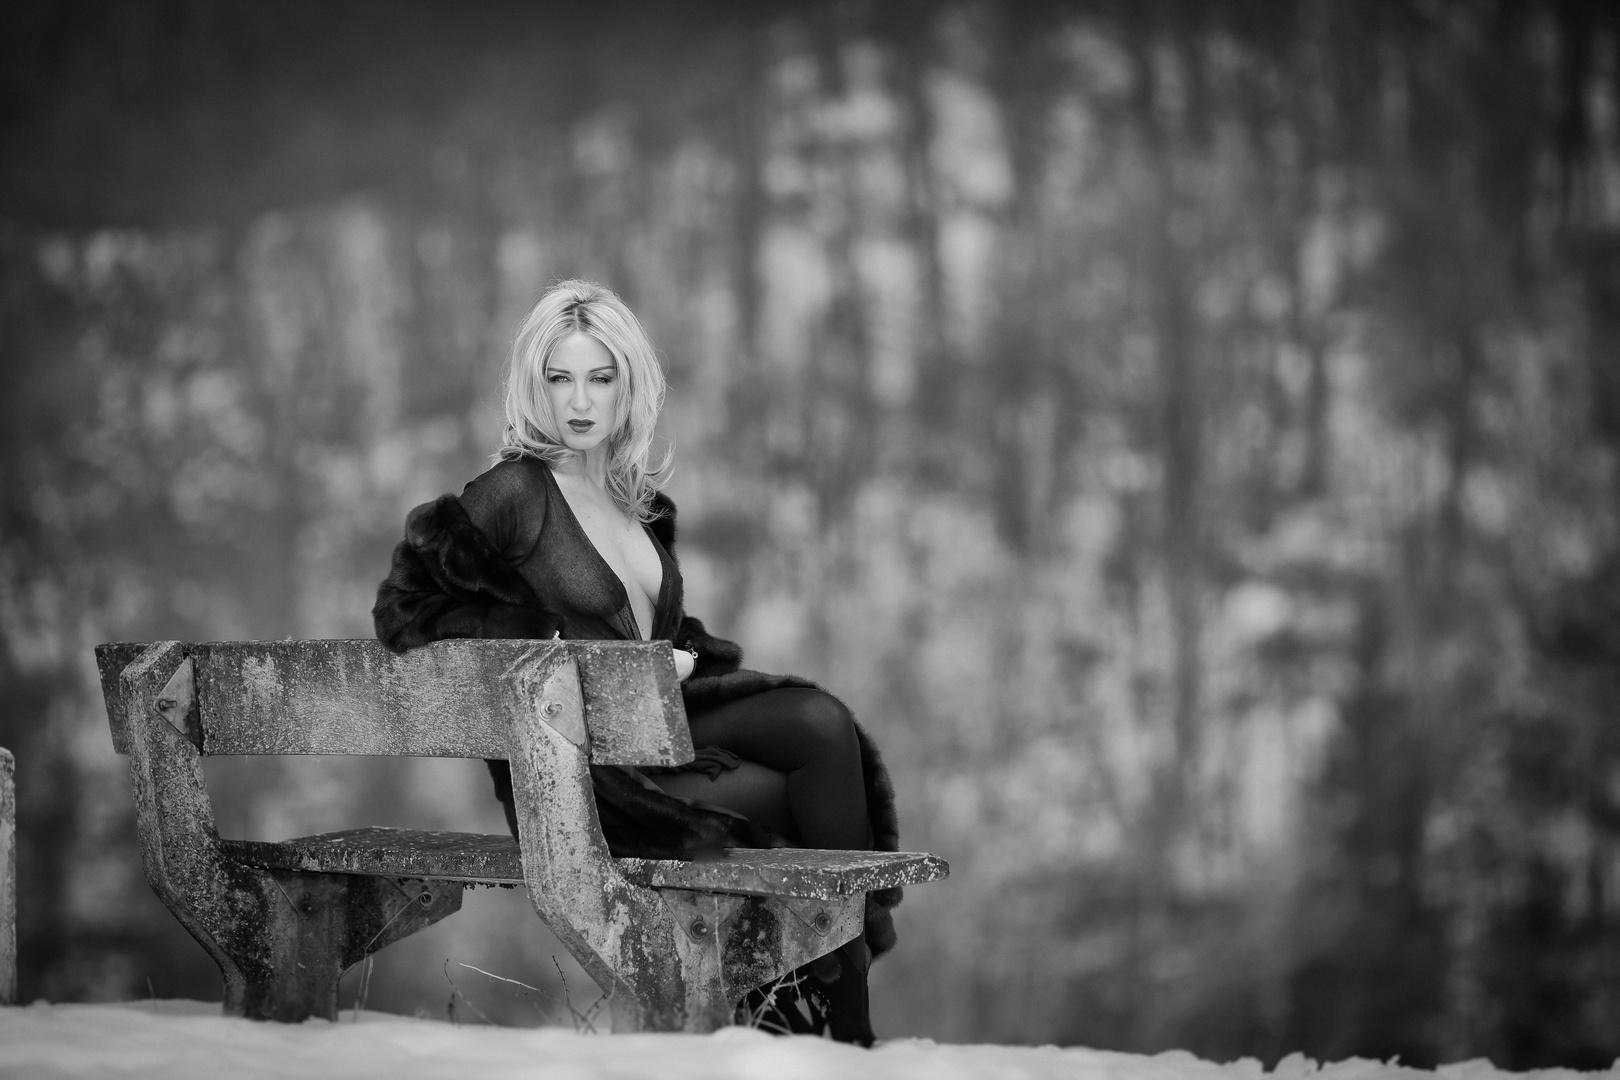 Russischer Winter 2